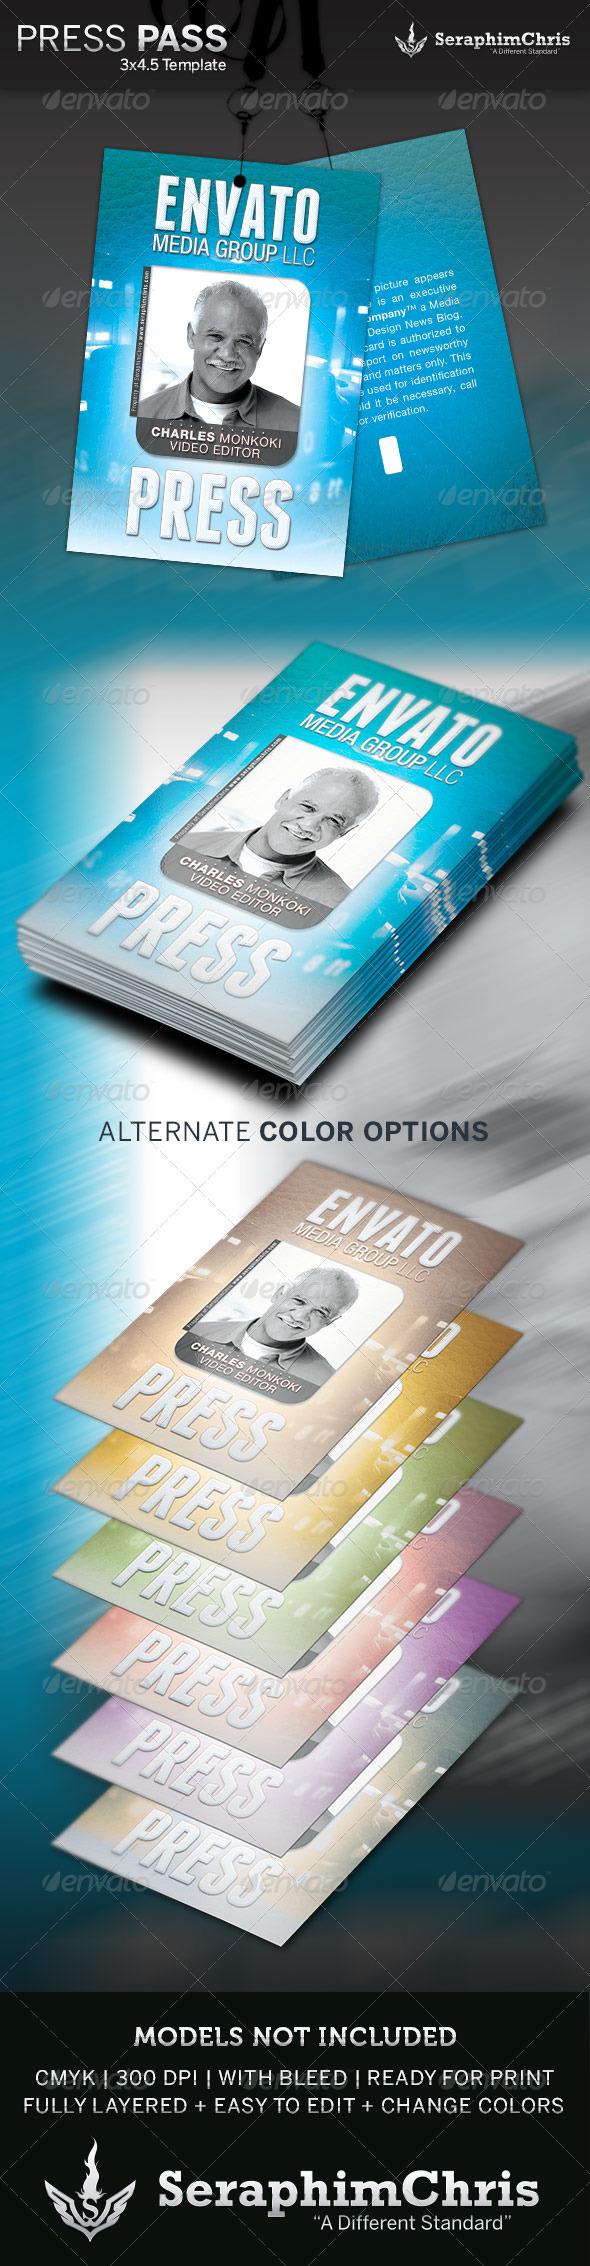 Press Pass Template - Miscellaneous Print Templates